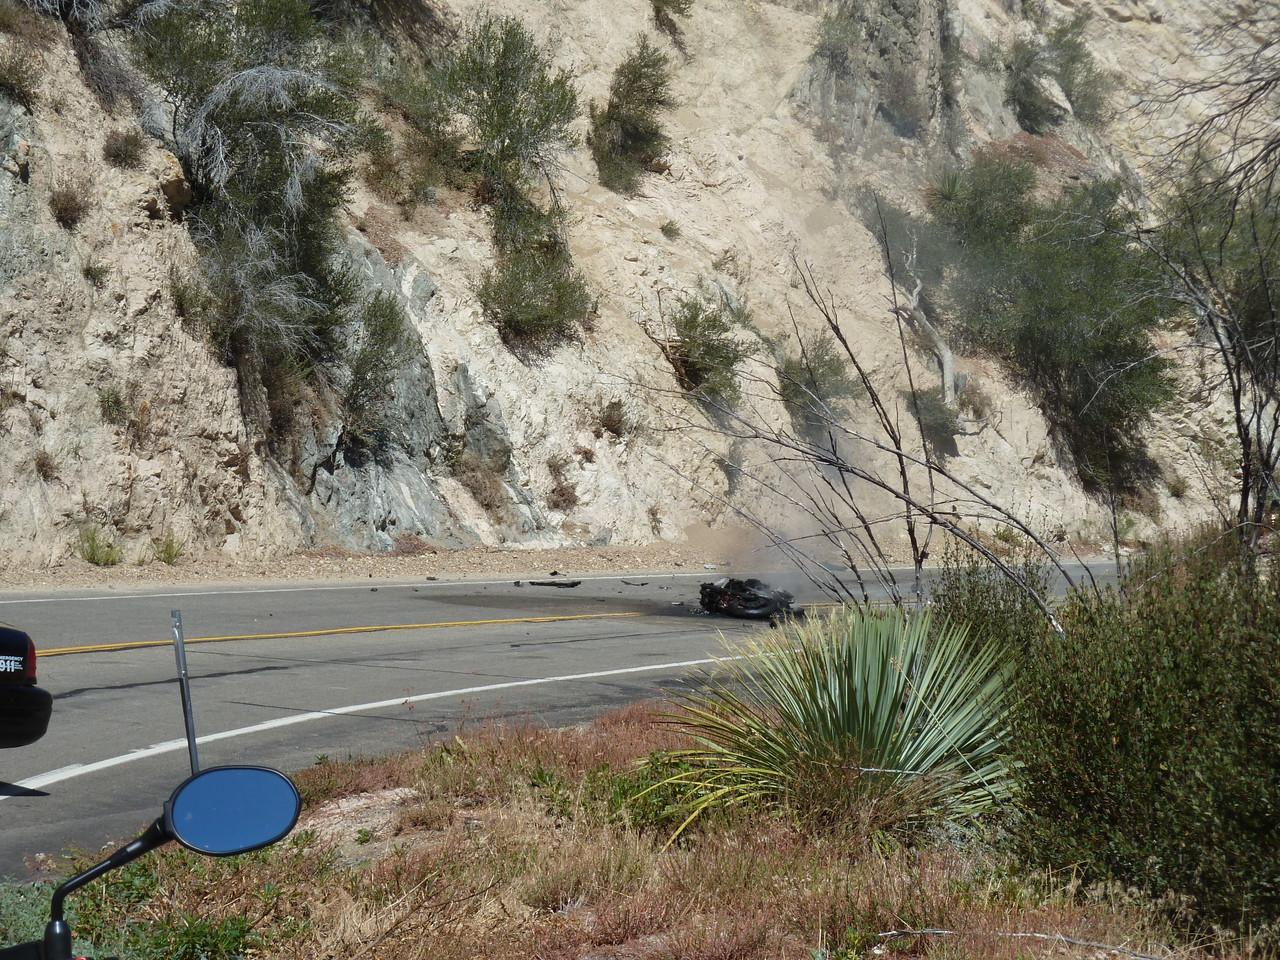 Burning motorcycle on Angeles Crest